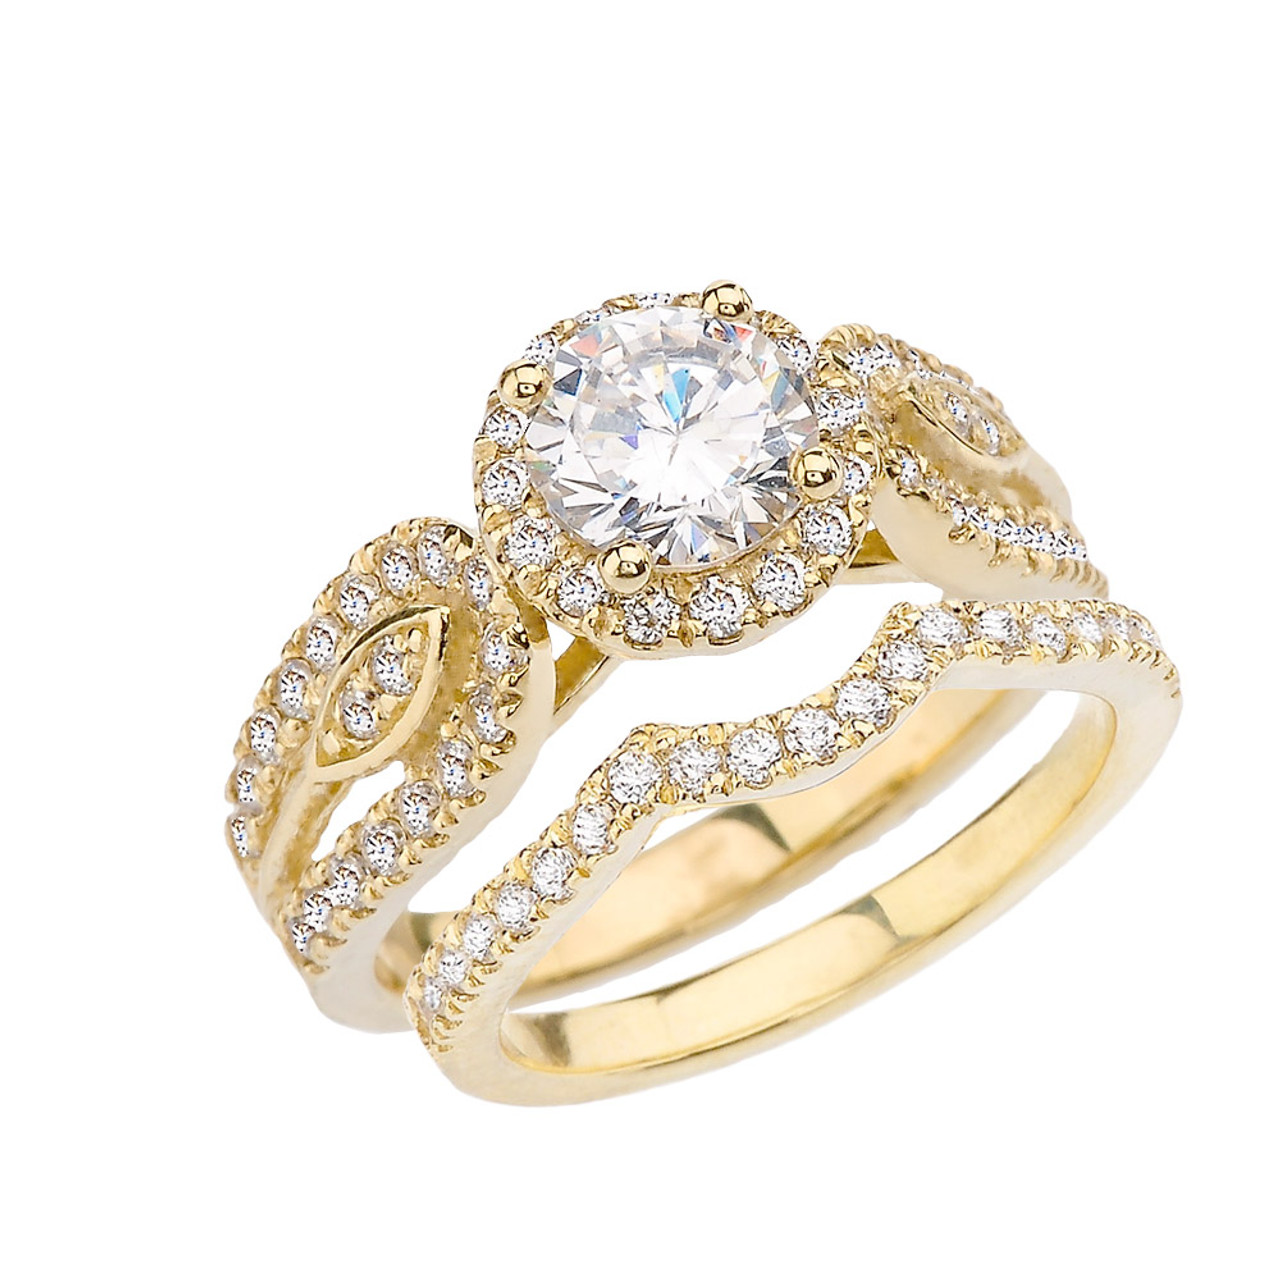 15+ Yellow Gold Cz Wedding Ring Sets Pics